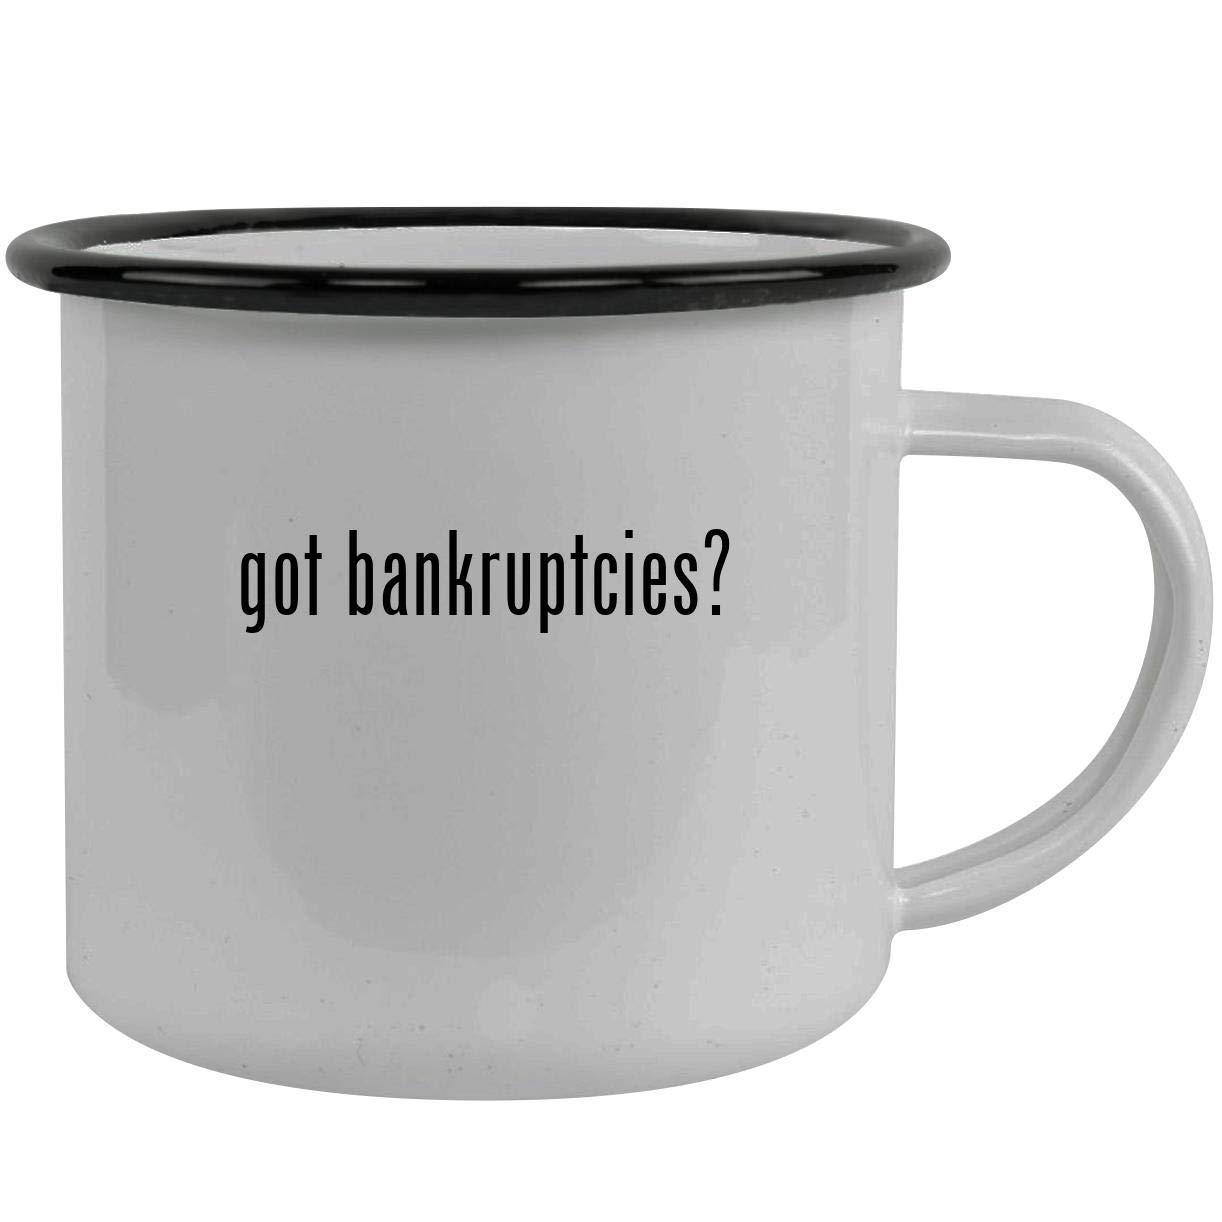 got bankruptcies? - Stainless Steel 12oz Camping Mug, Black